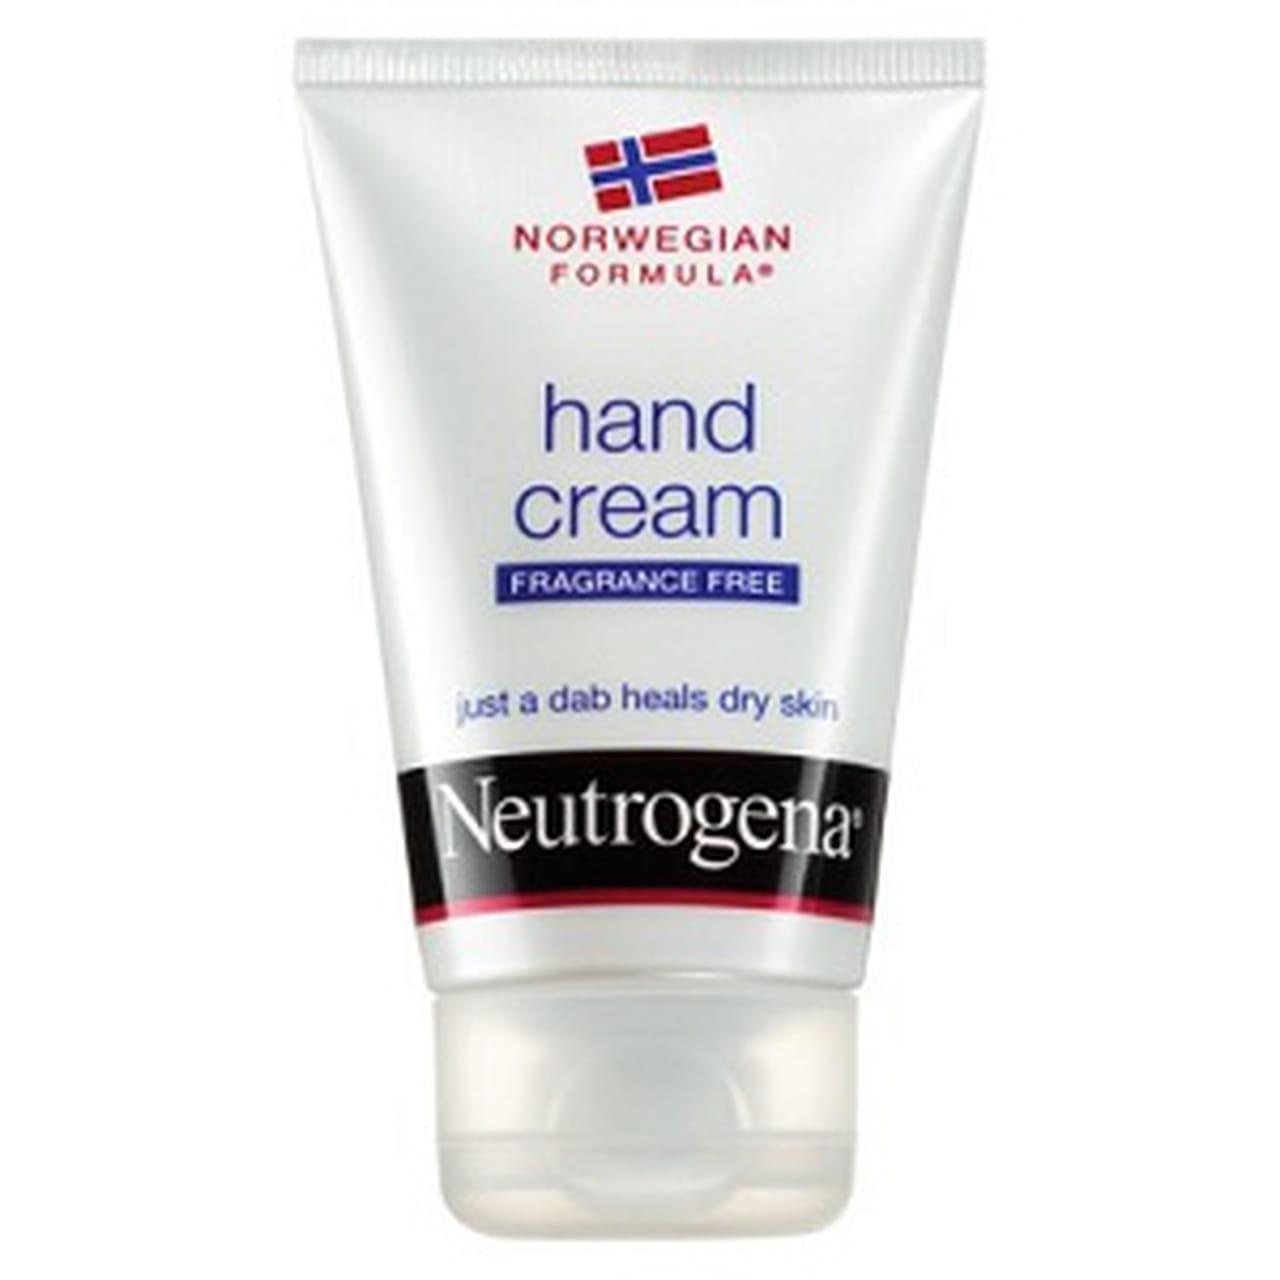 3e115779e 7- Neutrogena Norwegian Formula Fragrance Free. كريم مميز مع تركيبة غنية  لترطيب وحماية اليدين.